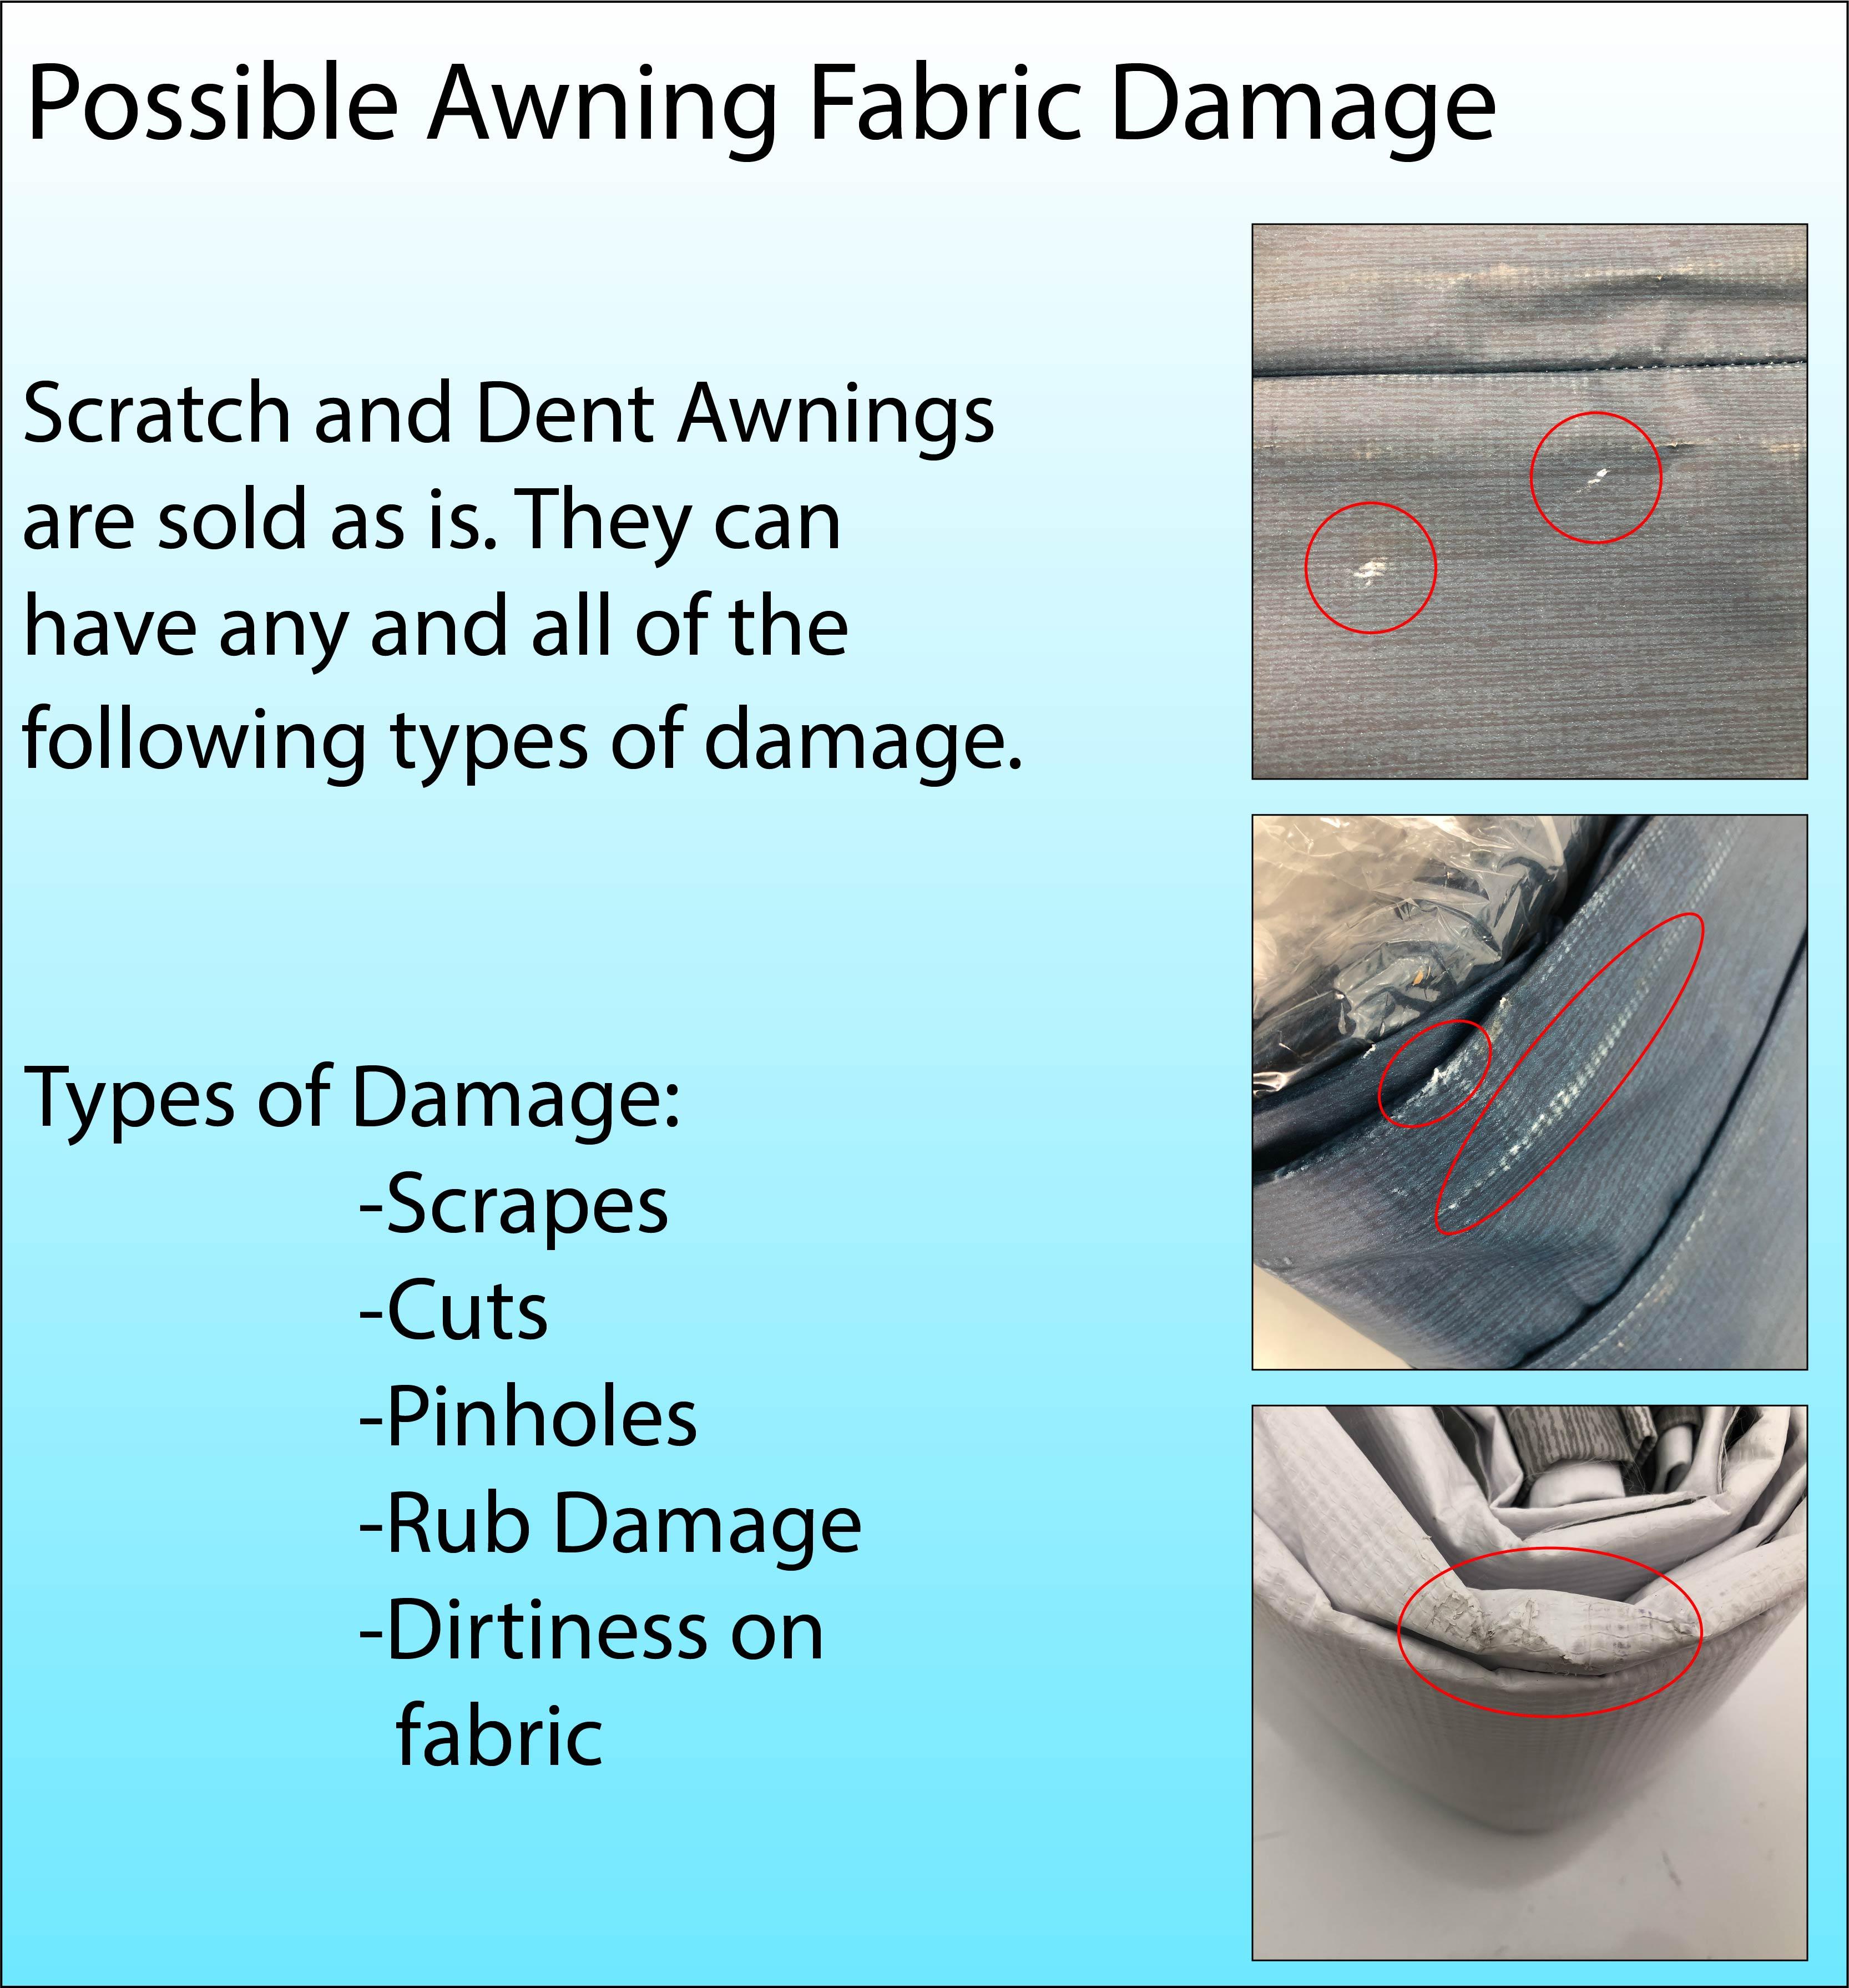 awning-fabric-graphic-updated.jpg